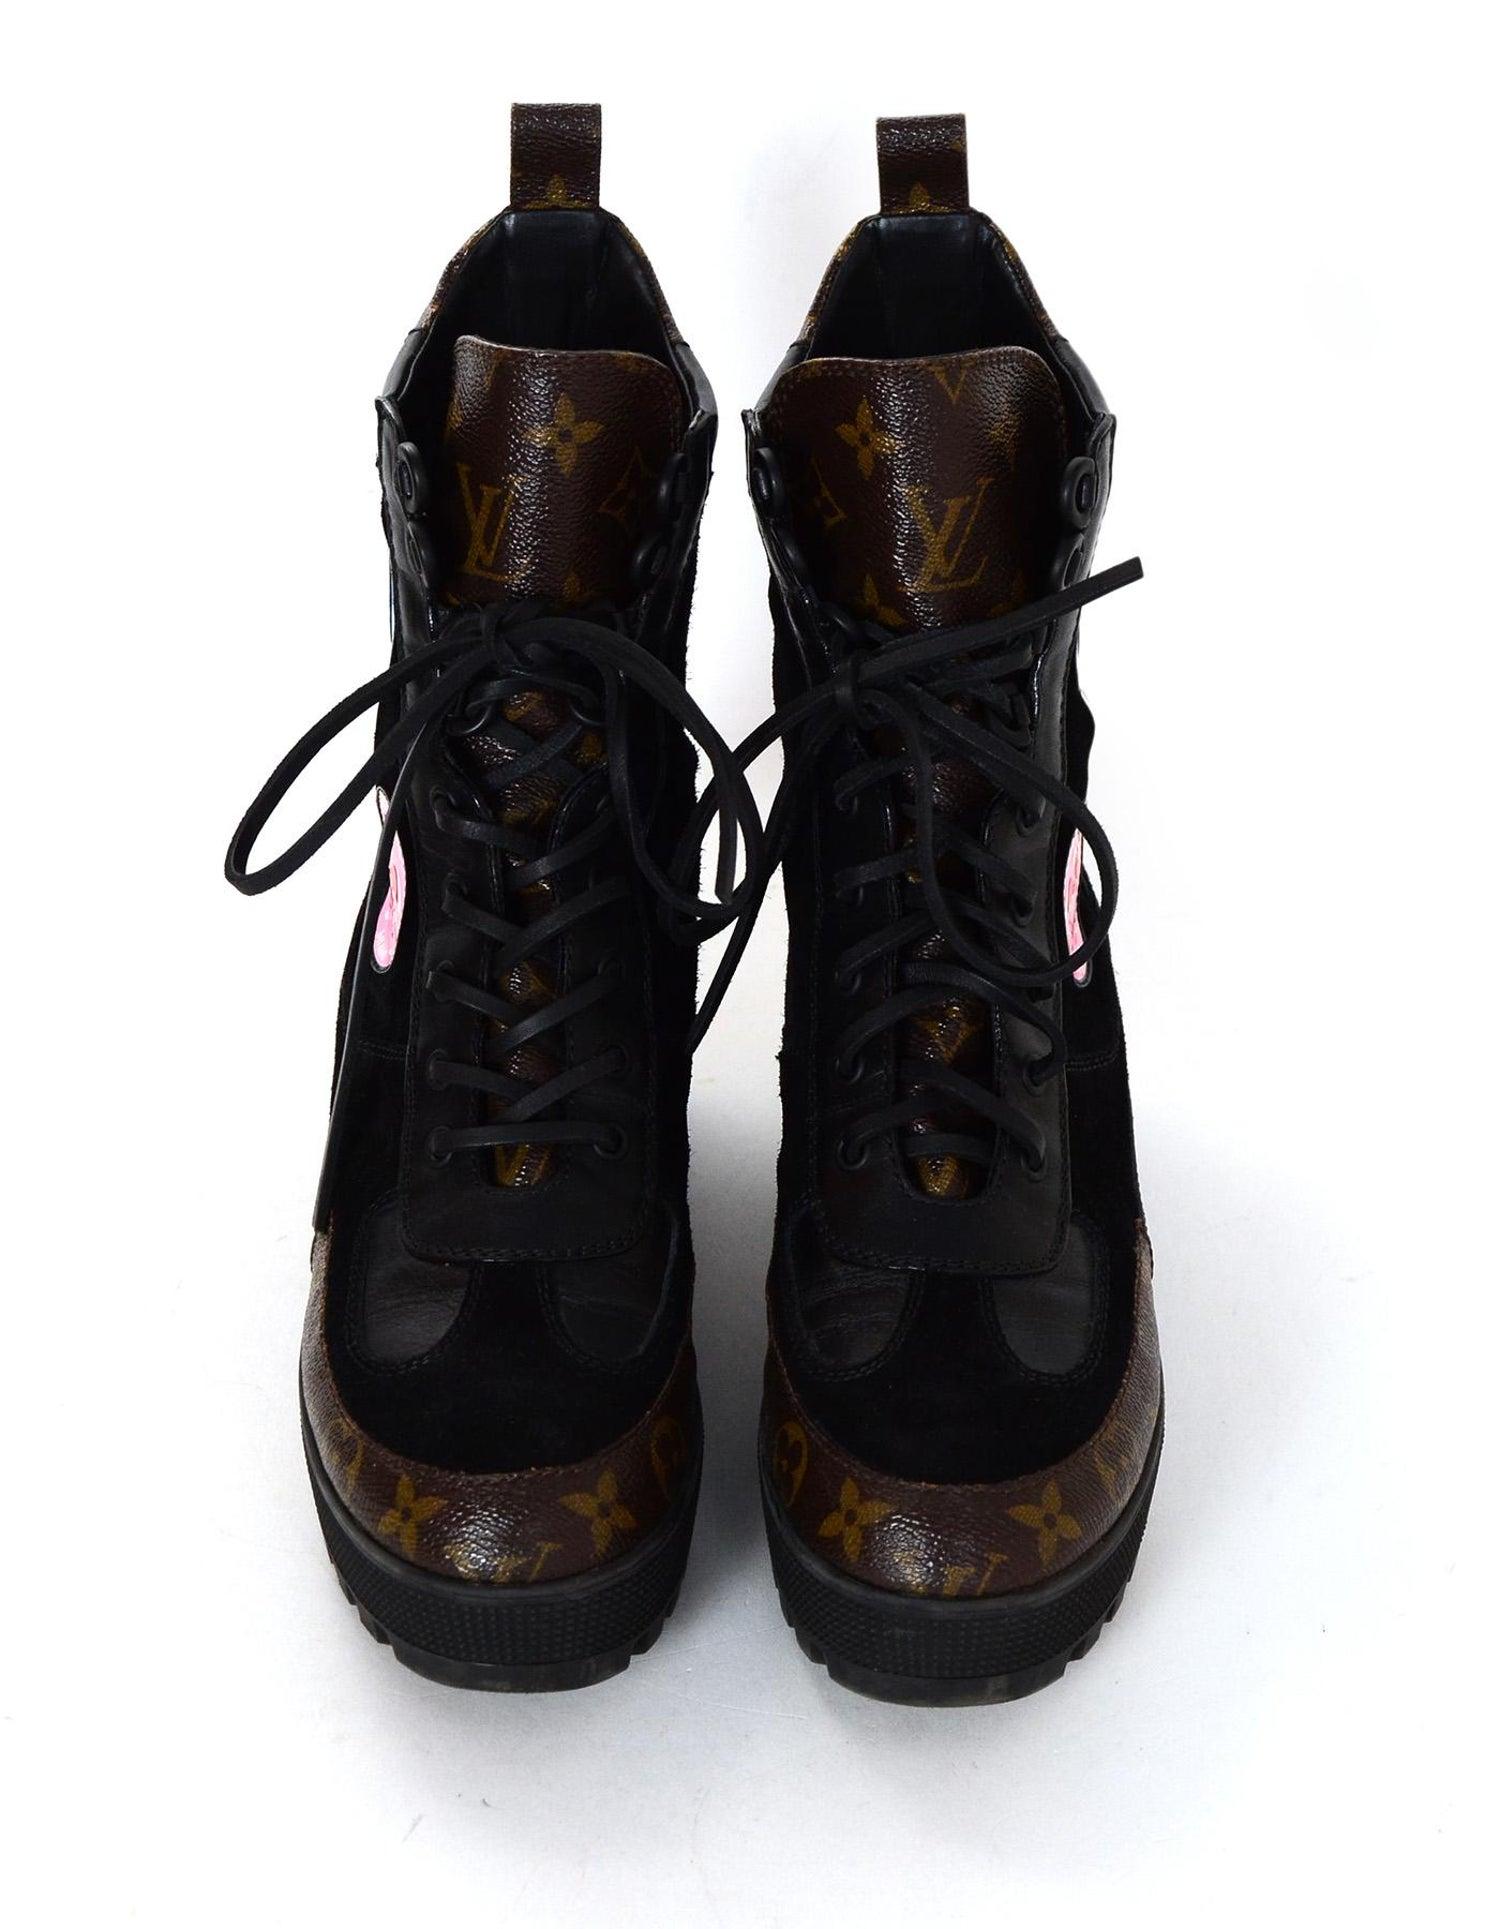 ac2aaebce787 Louis Vuitton Monogram Suede Leather Checkpoint Platform Desert Boots Sz  39.5 For Sale at 1stdibs